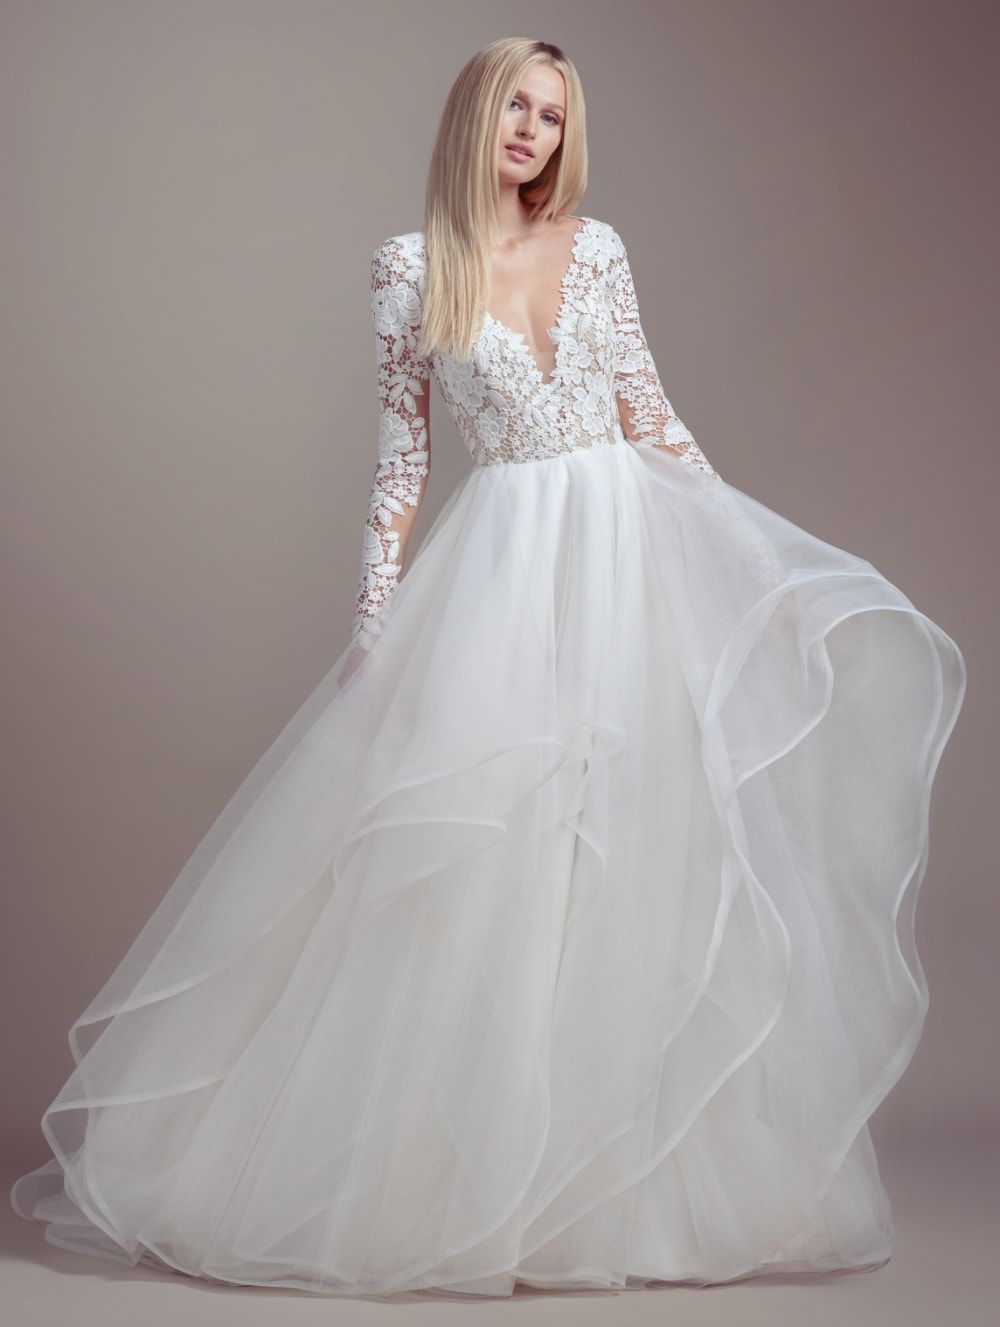 Long Sleeve Ball Gown Wedding Dress Blush By Hayley Paige Wedding Dresse Long Sleeve Ball Gown Wedding Dress Wedding Dresses Kleinfeld Long Sleeve Ball Gowns [ 1327 x 1000 Pixel ]